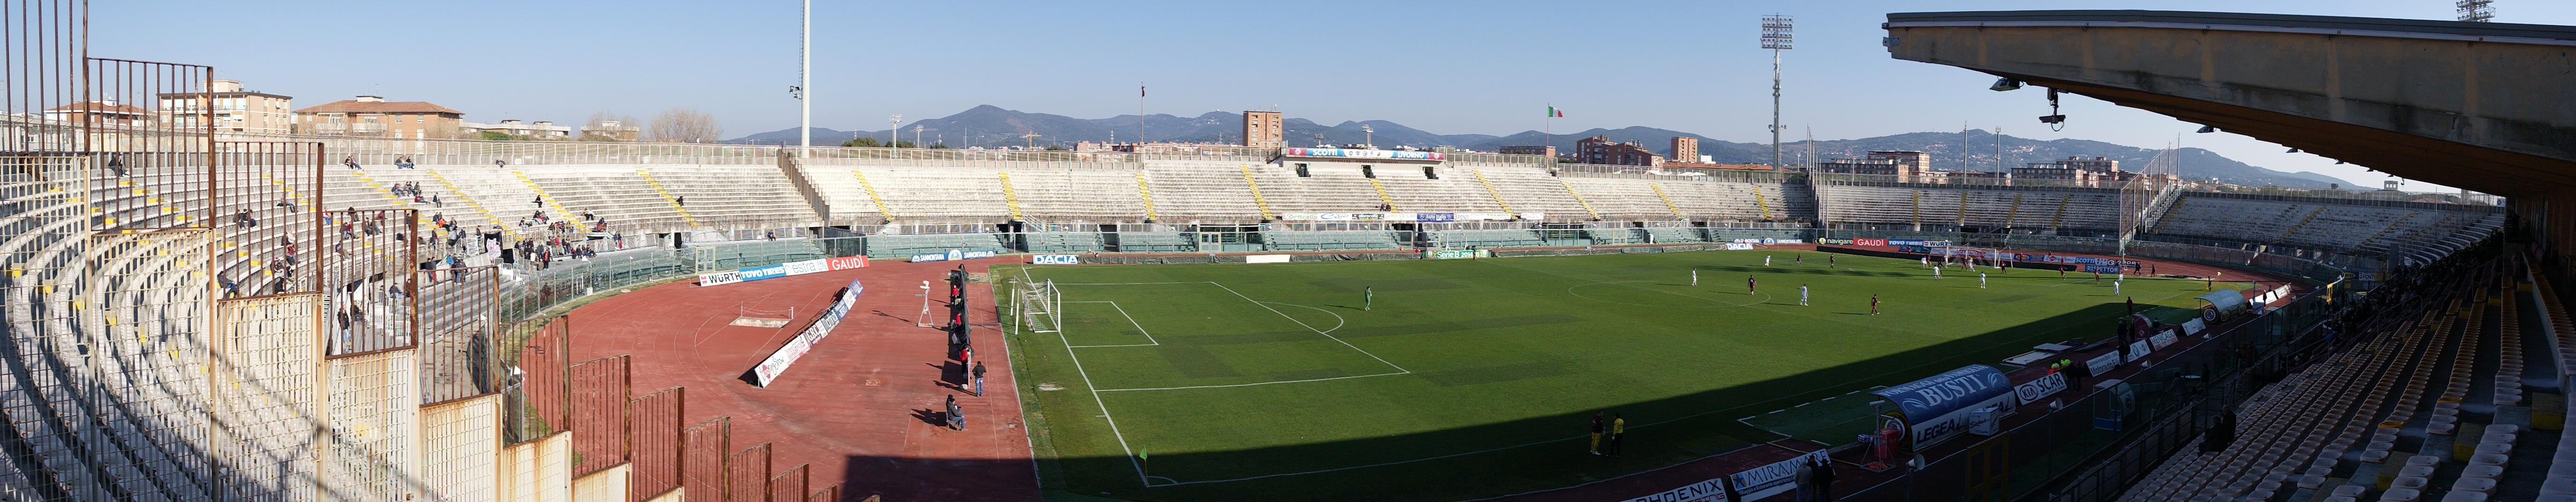 File Stadio Armando Picchi panorama JPG Wikimedia mons